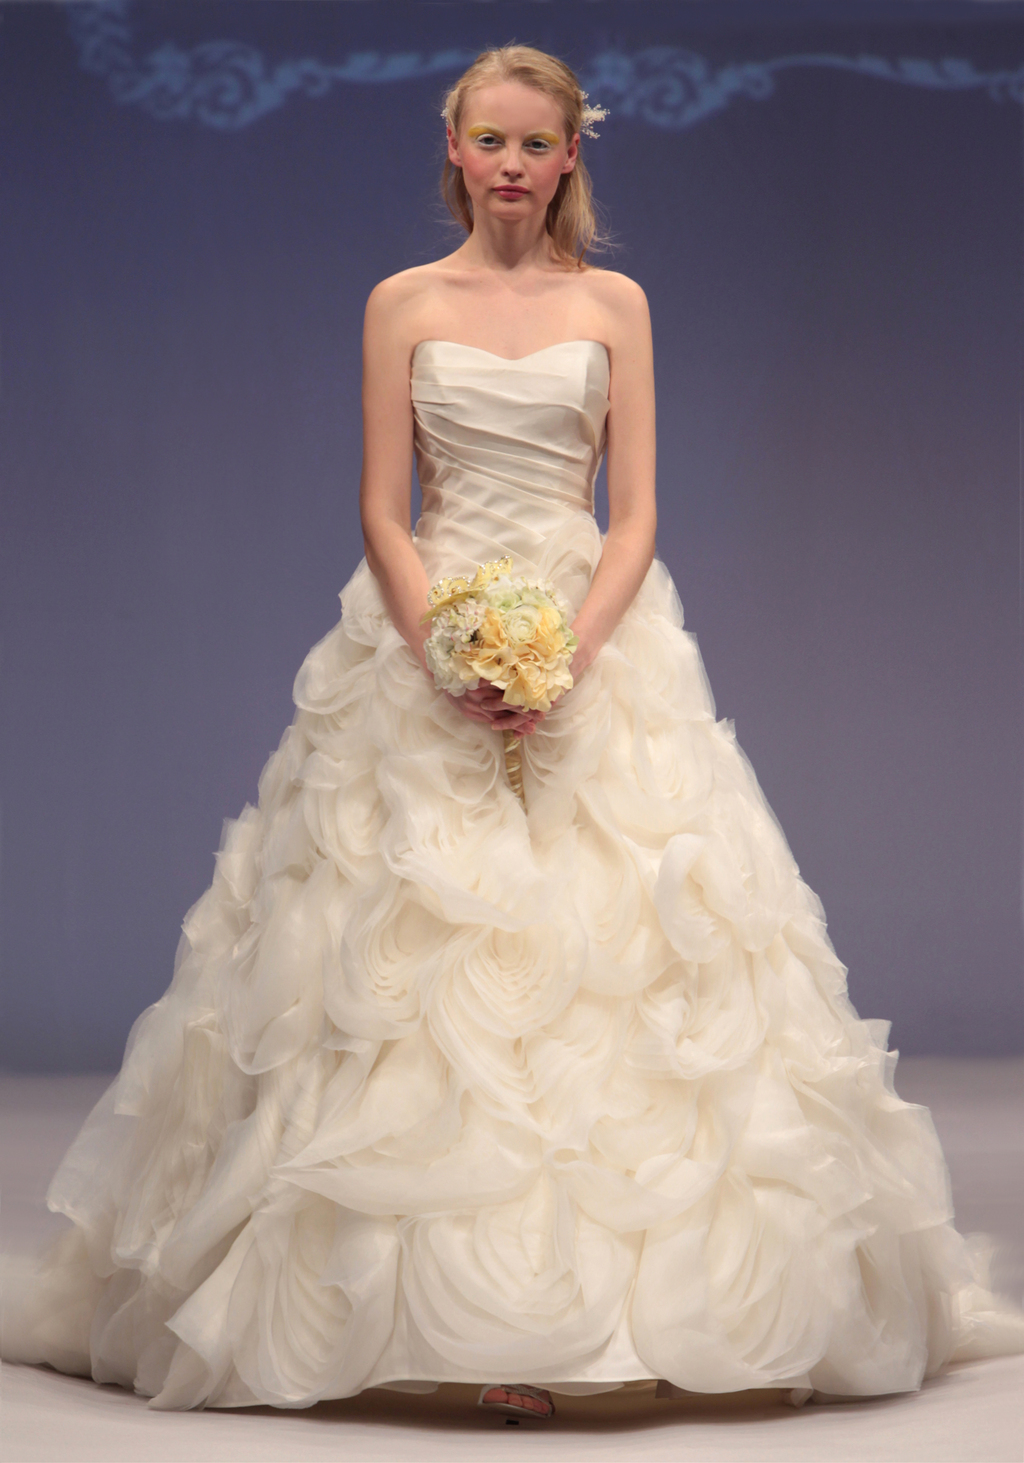 Winnie-couture-bridal-gown-spring-2013-wedding-dress-pierretta.full